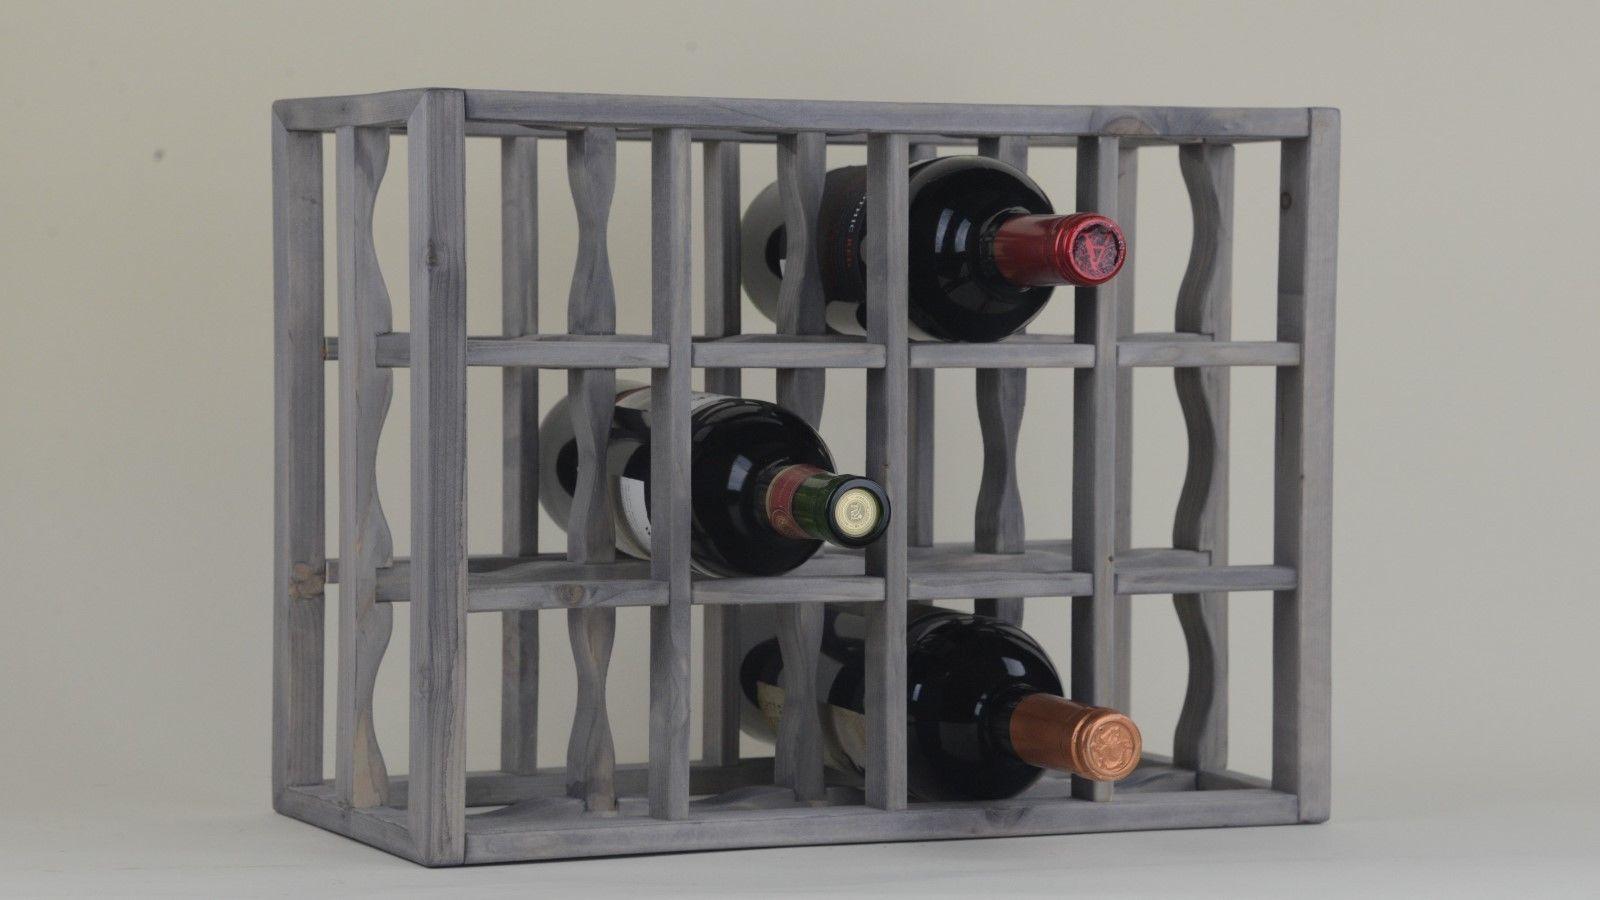 Victoria Wine Rack 12 Bottles Solid Wood Weathered Look Countertop